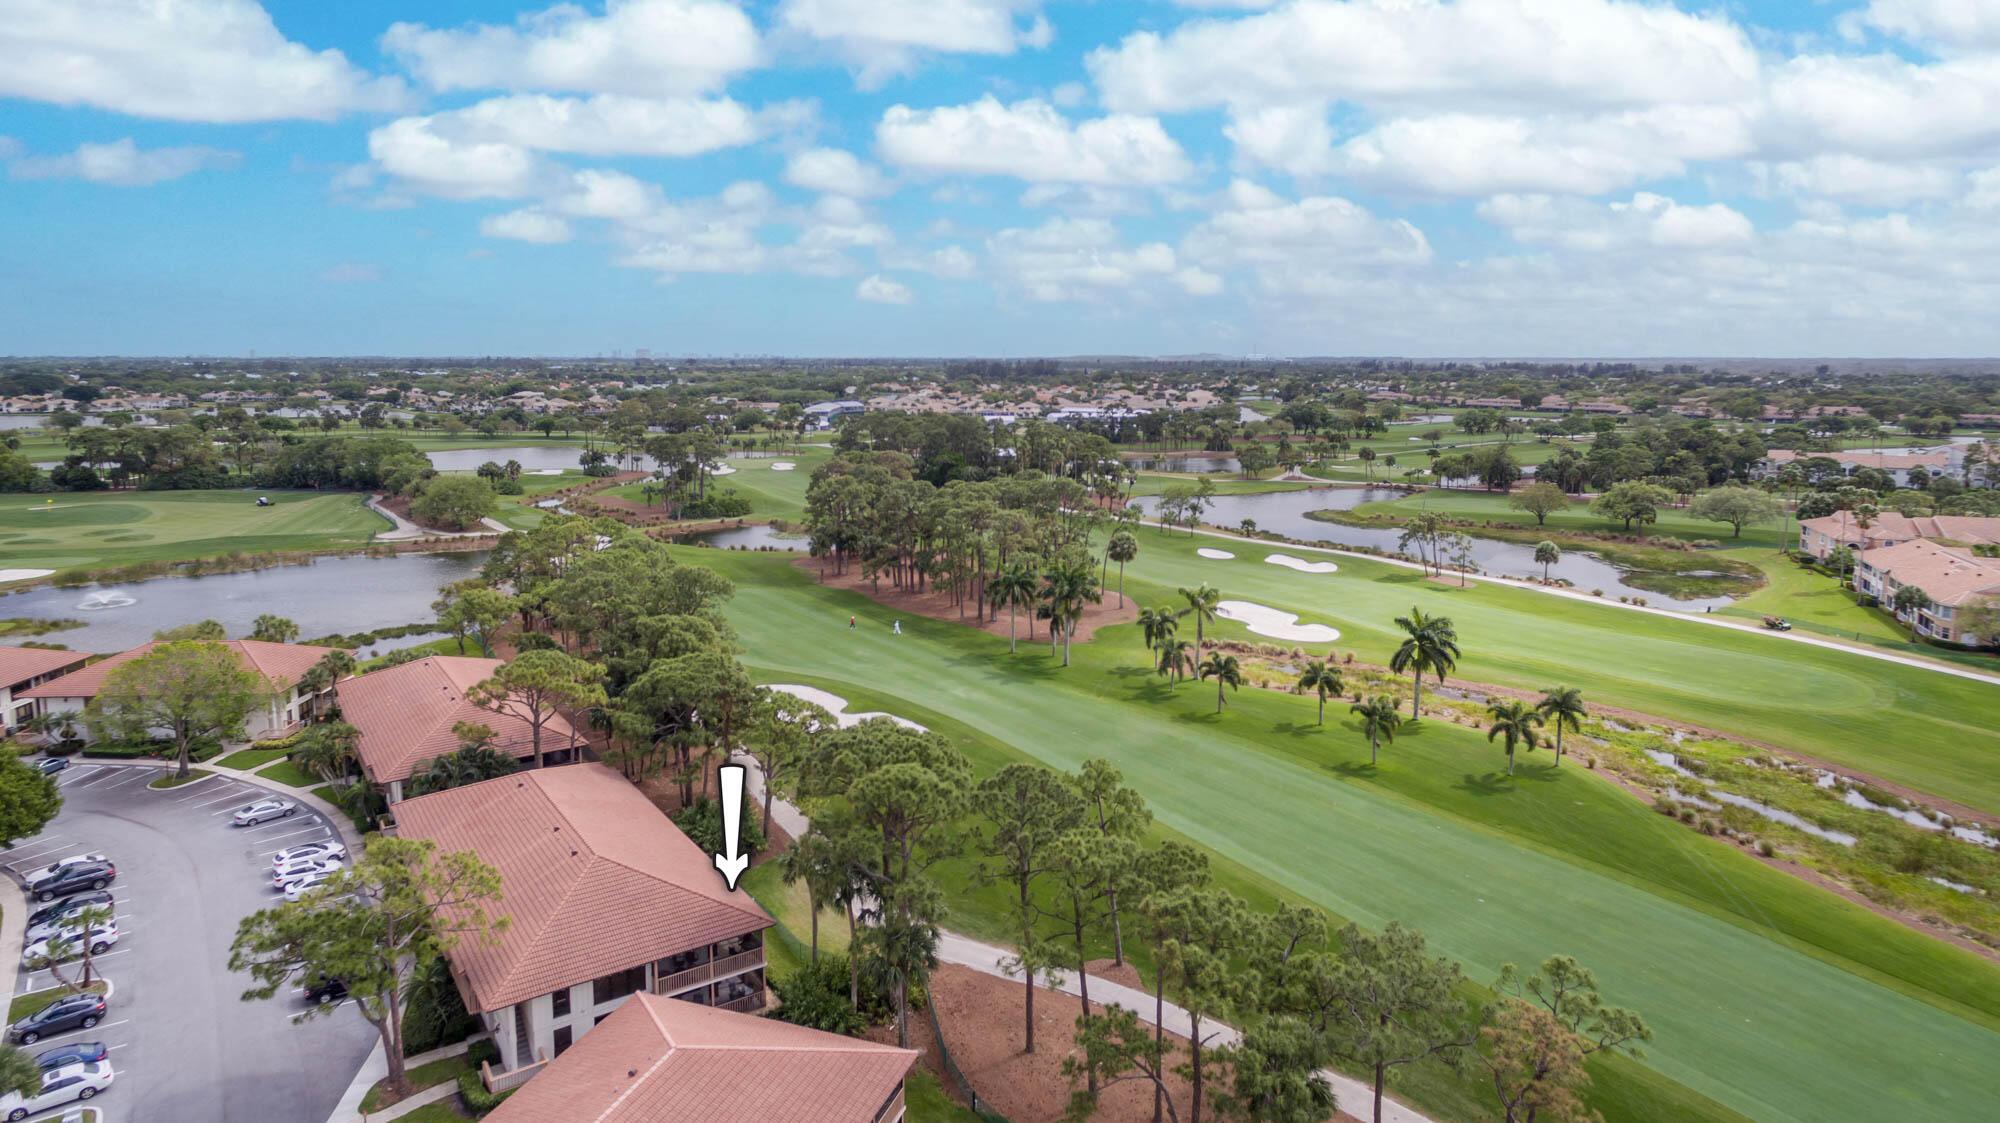 308 Brackenwood Circle, Palm Beach Gardens, Florida 33418, 2 Bedrooms Bedrooms, ,2 BathroomsBathrooms,F,Condominium,Brackenwood,RX-10699735